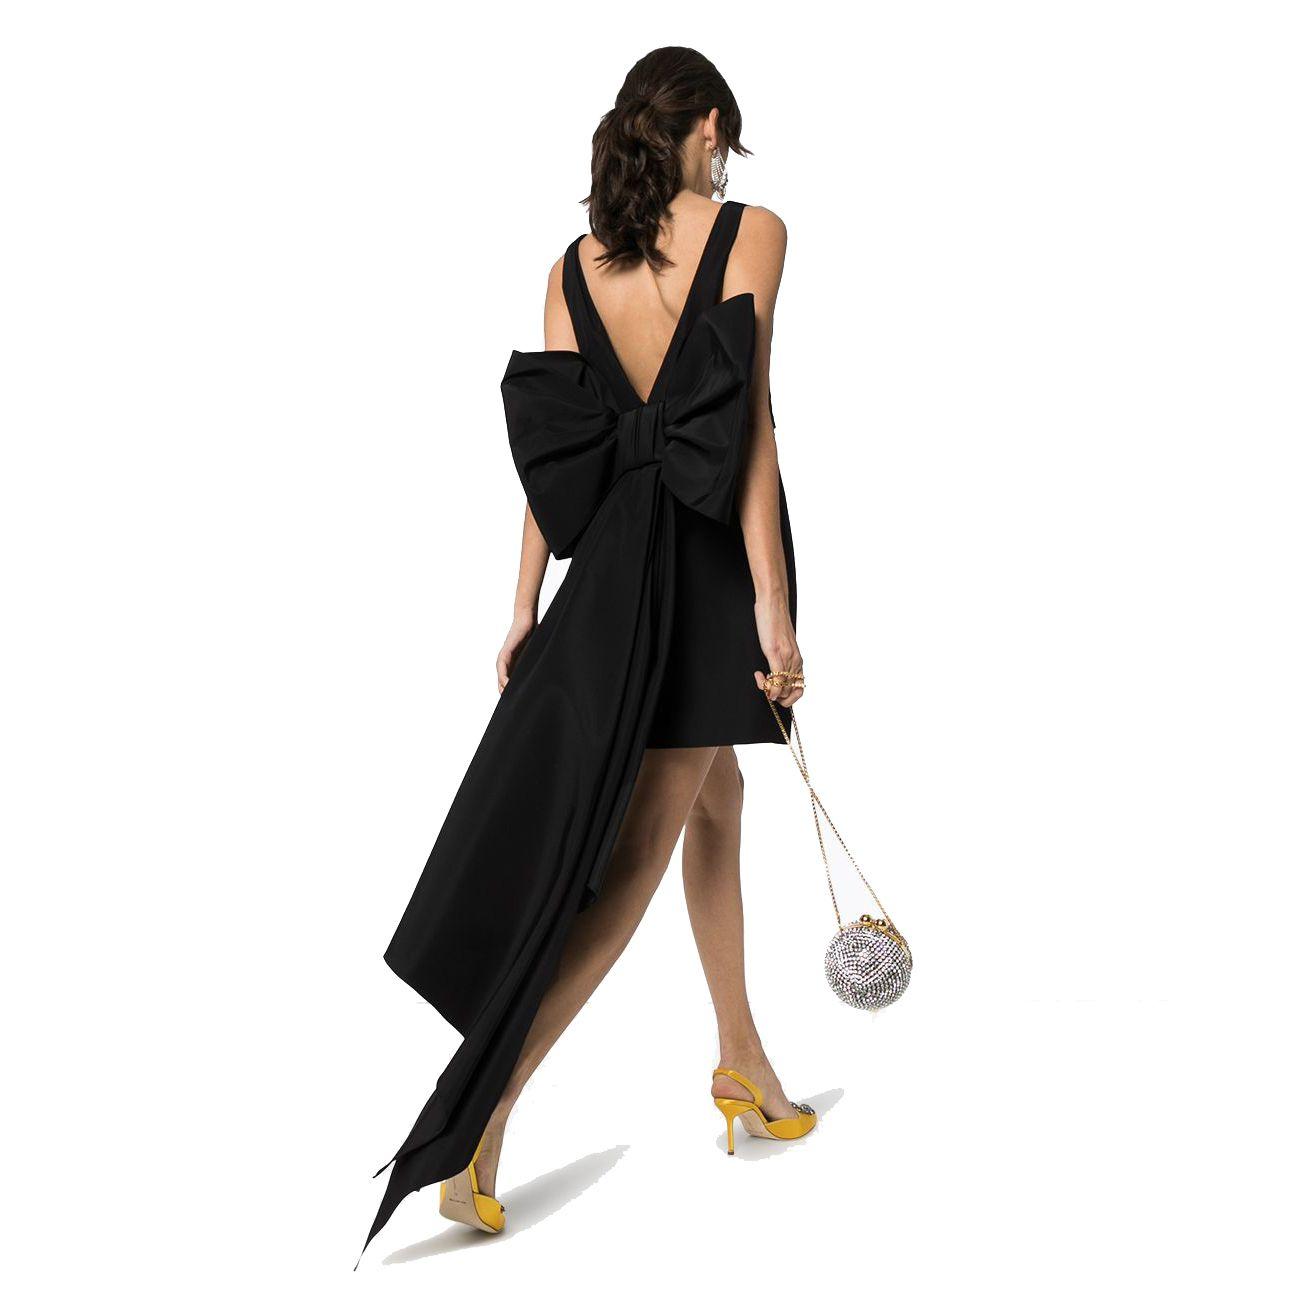 The 37 Best Black Wedding Dresses Of 2020,Wedding Bridal Dresses Hd